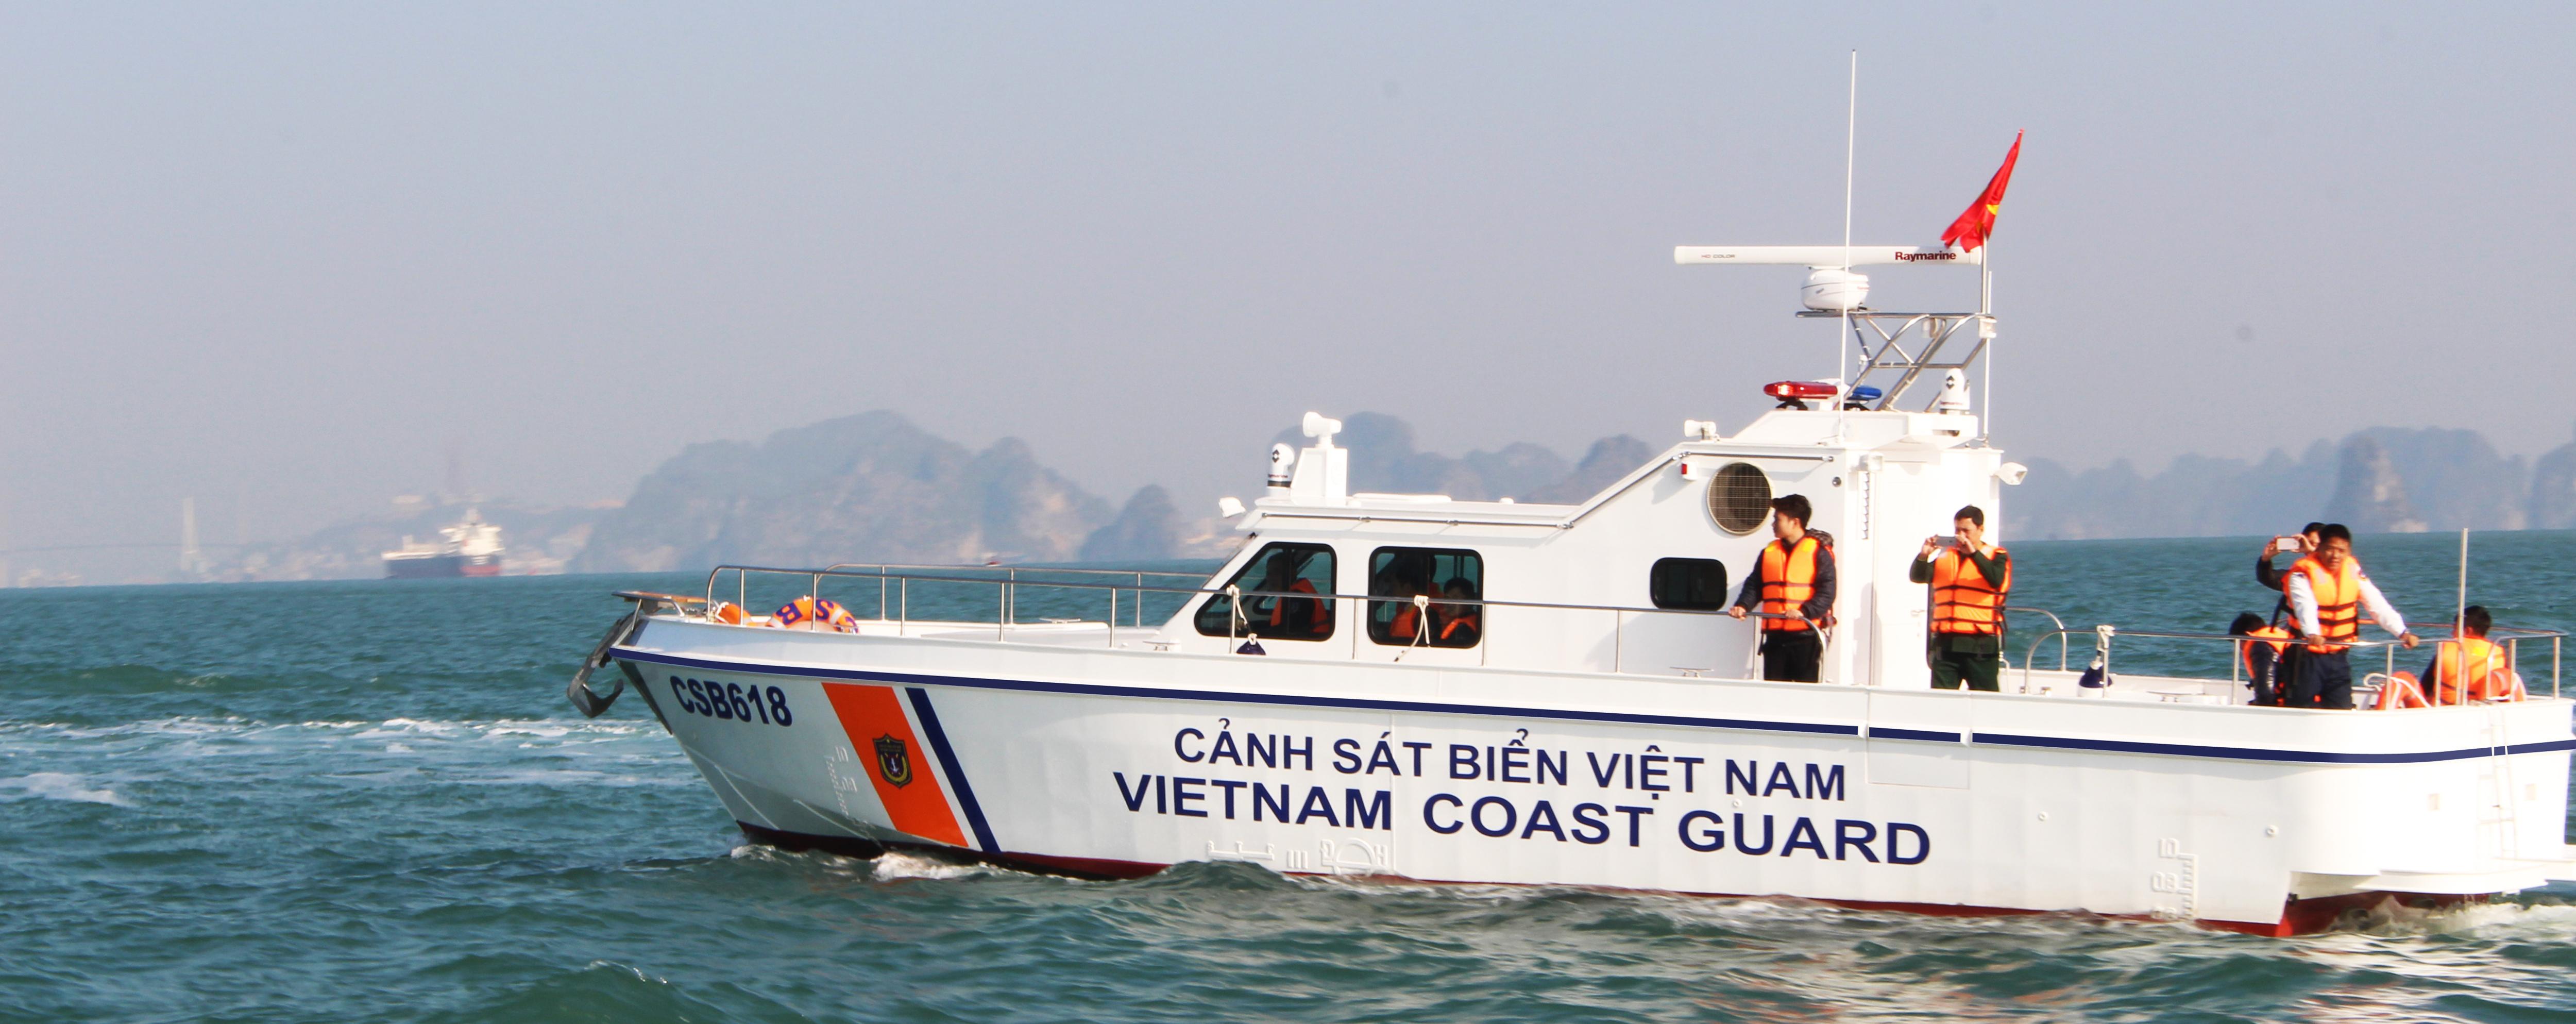 Tàu tuần tra cao tốc MS 50S